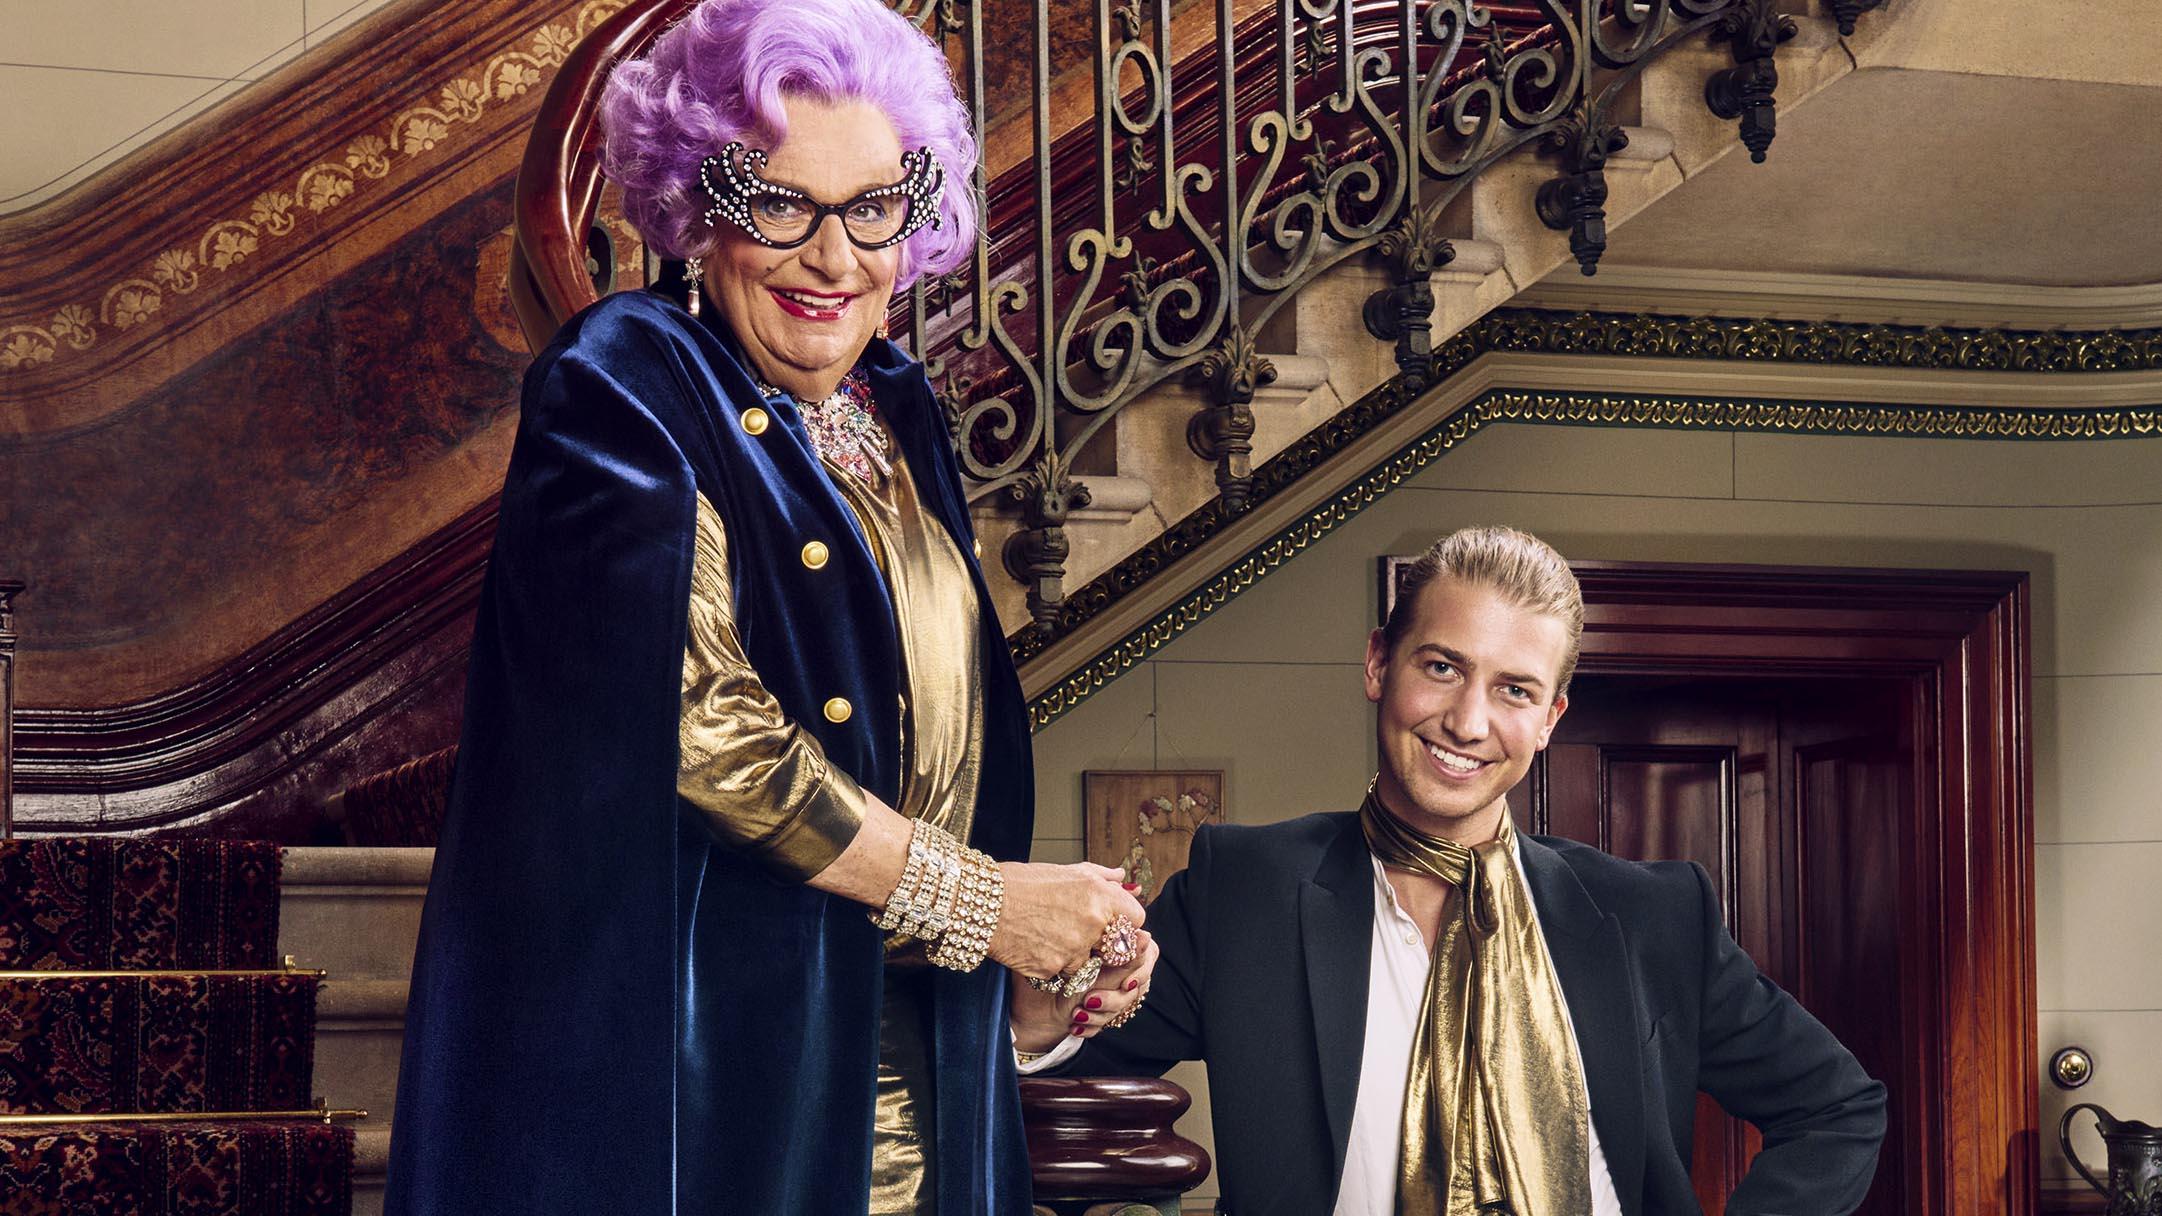 Dame Edna meets Prince Christian Wilkins